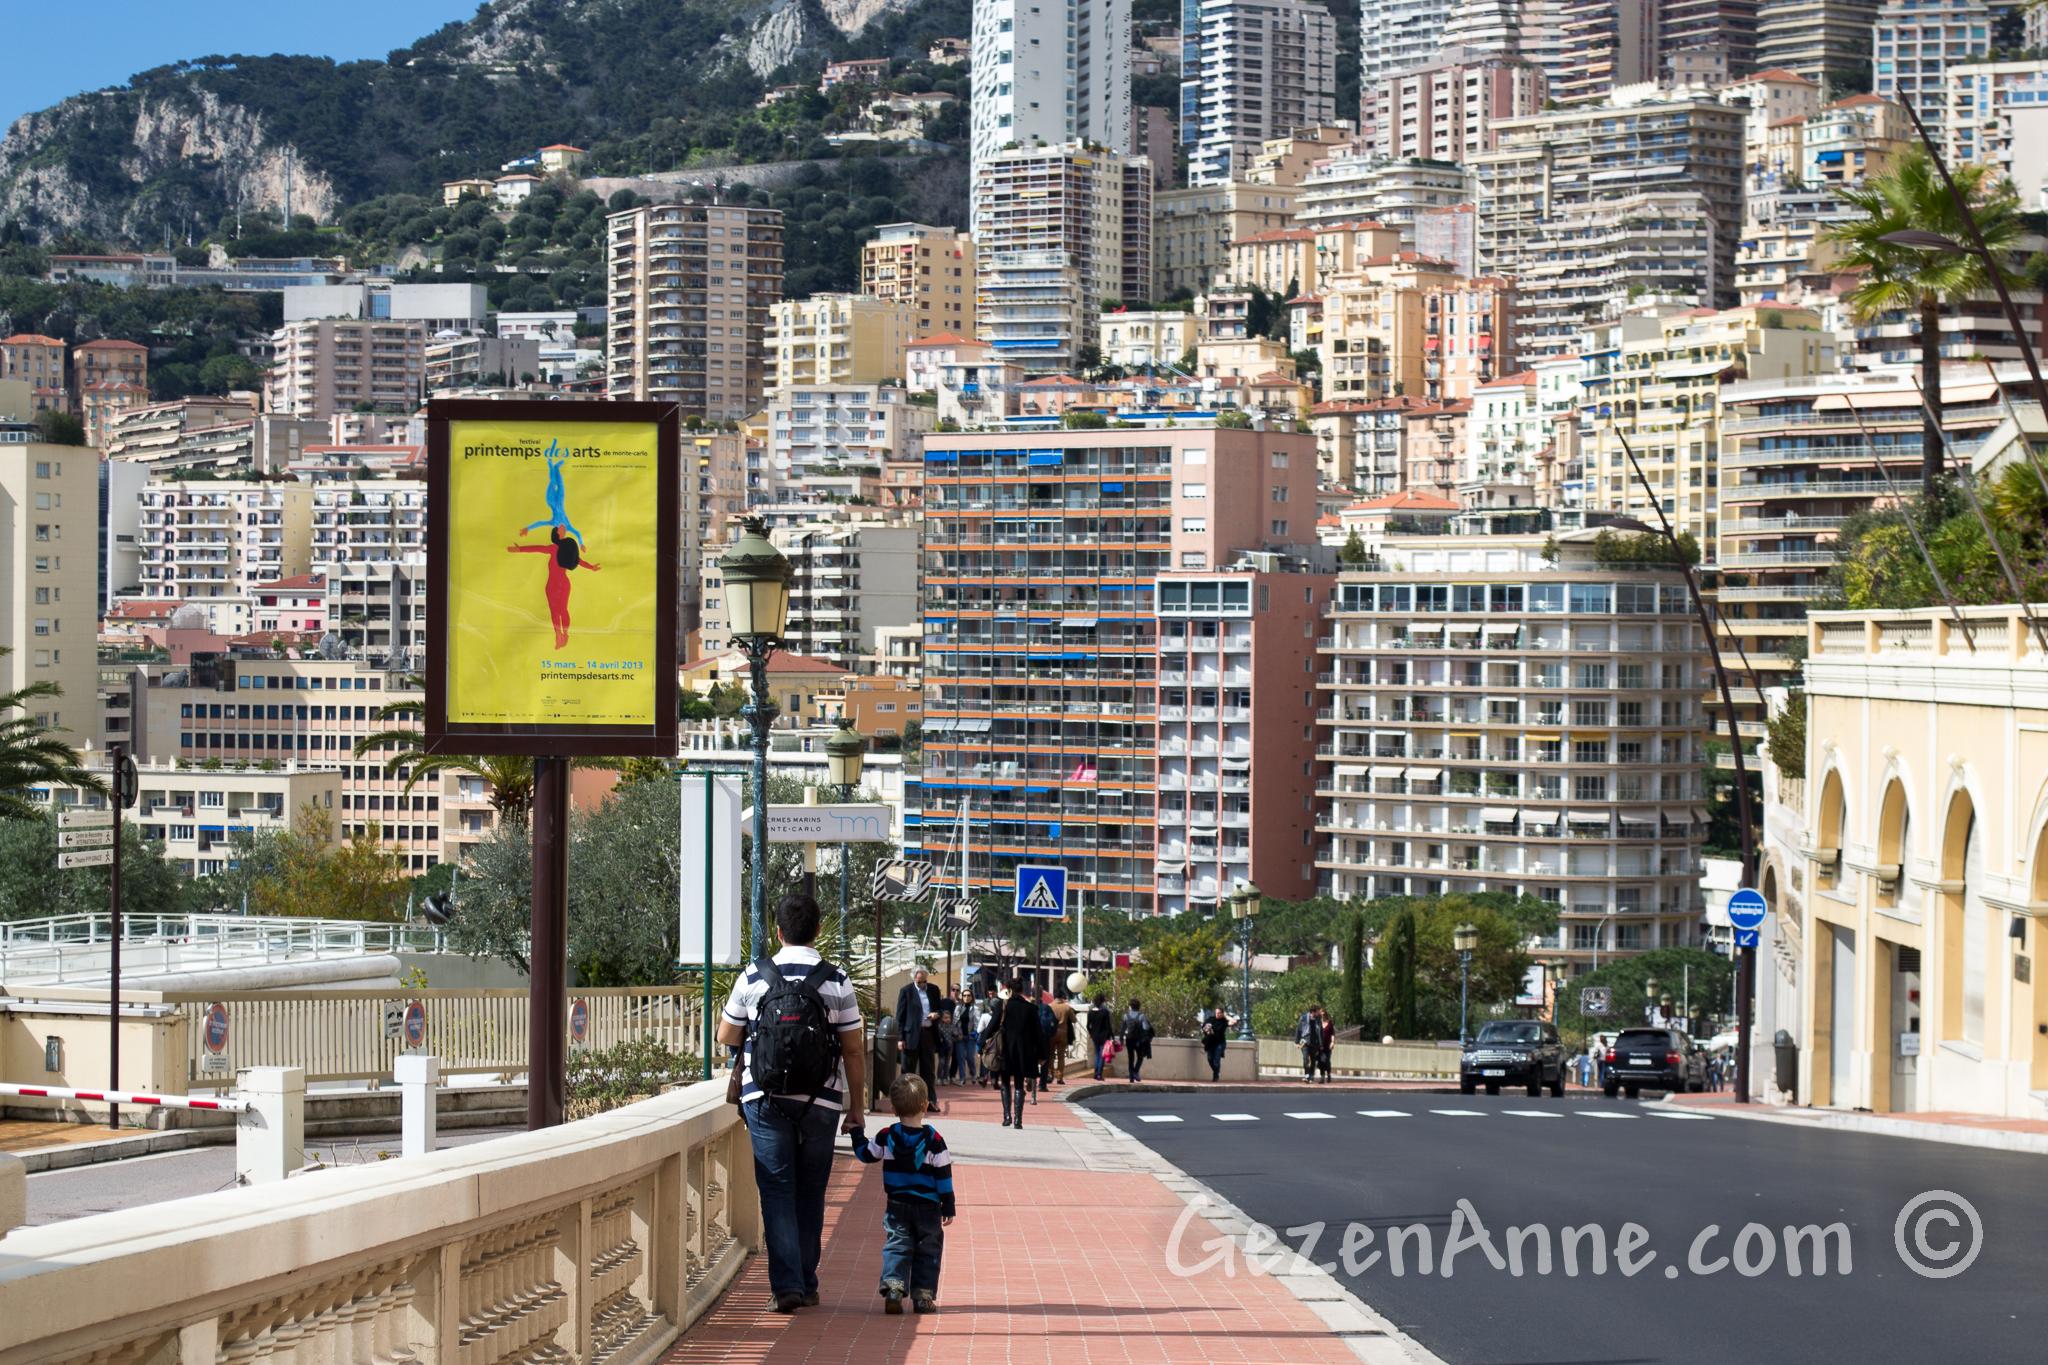 Monte Carlo'dan Monako'ya Formula 1 yolunda yürürken